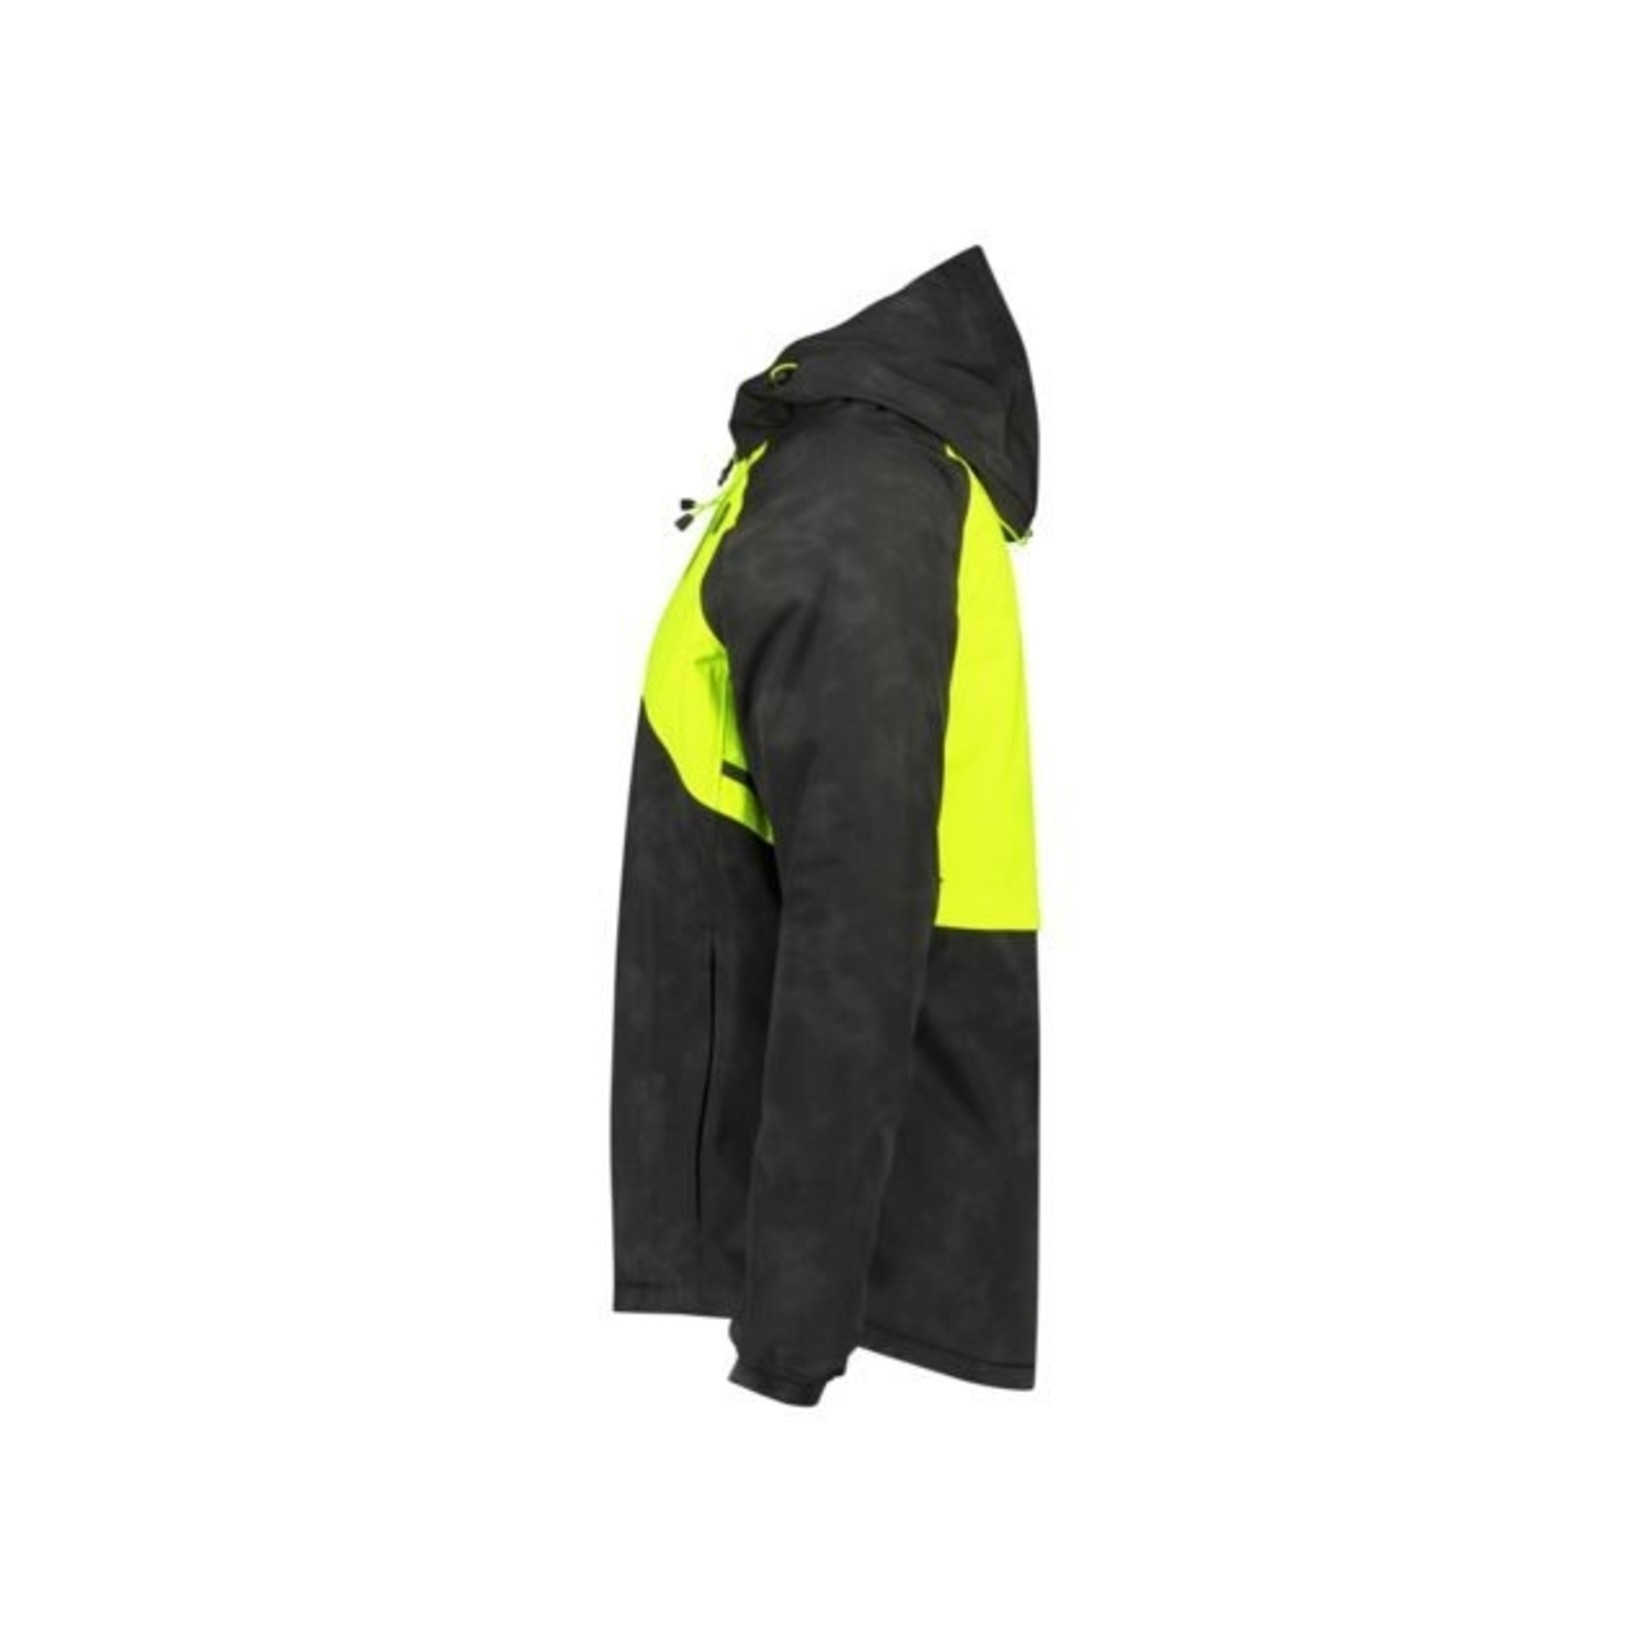 AGU AGU Commuter Jacke invernale Regen Hi-vis/Reflection uomo